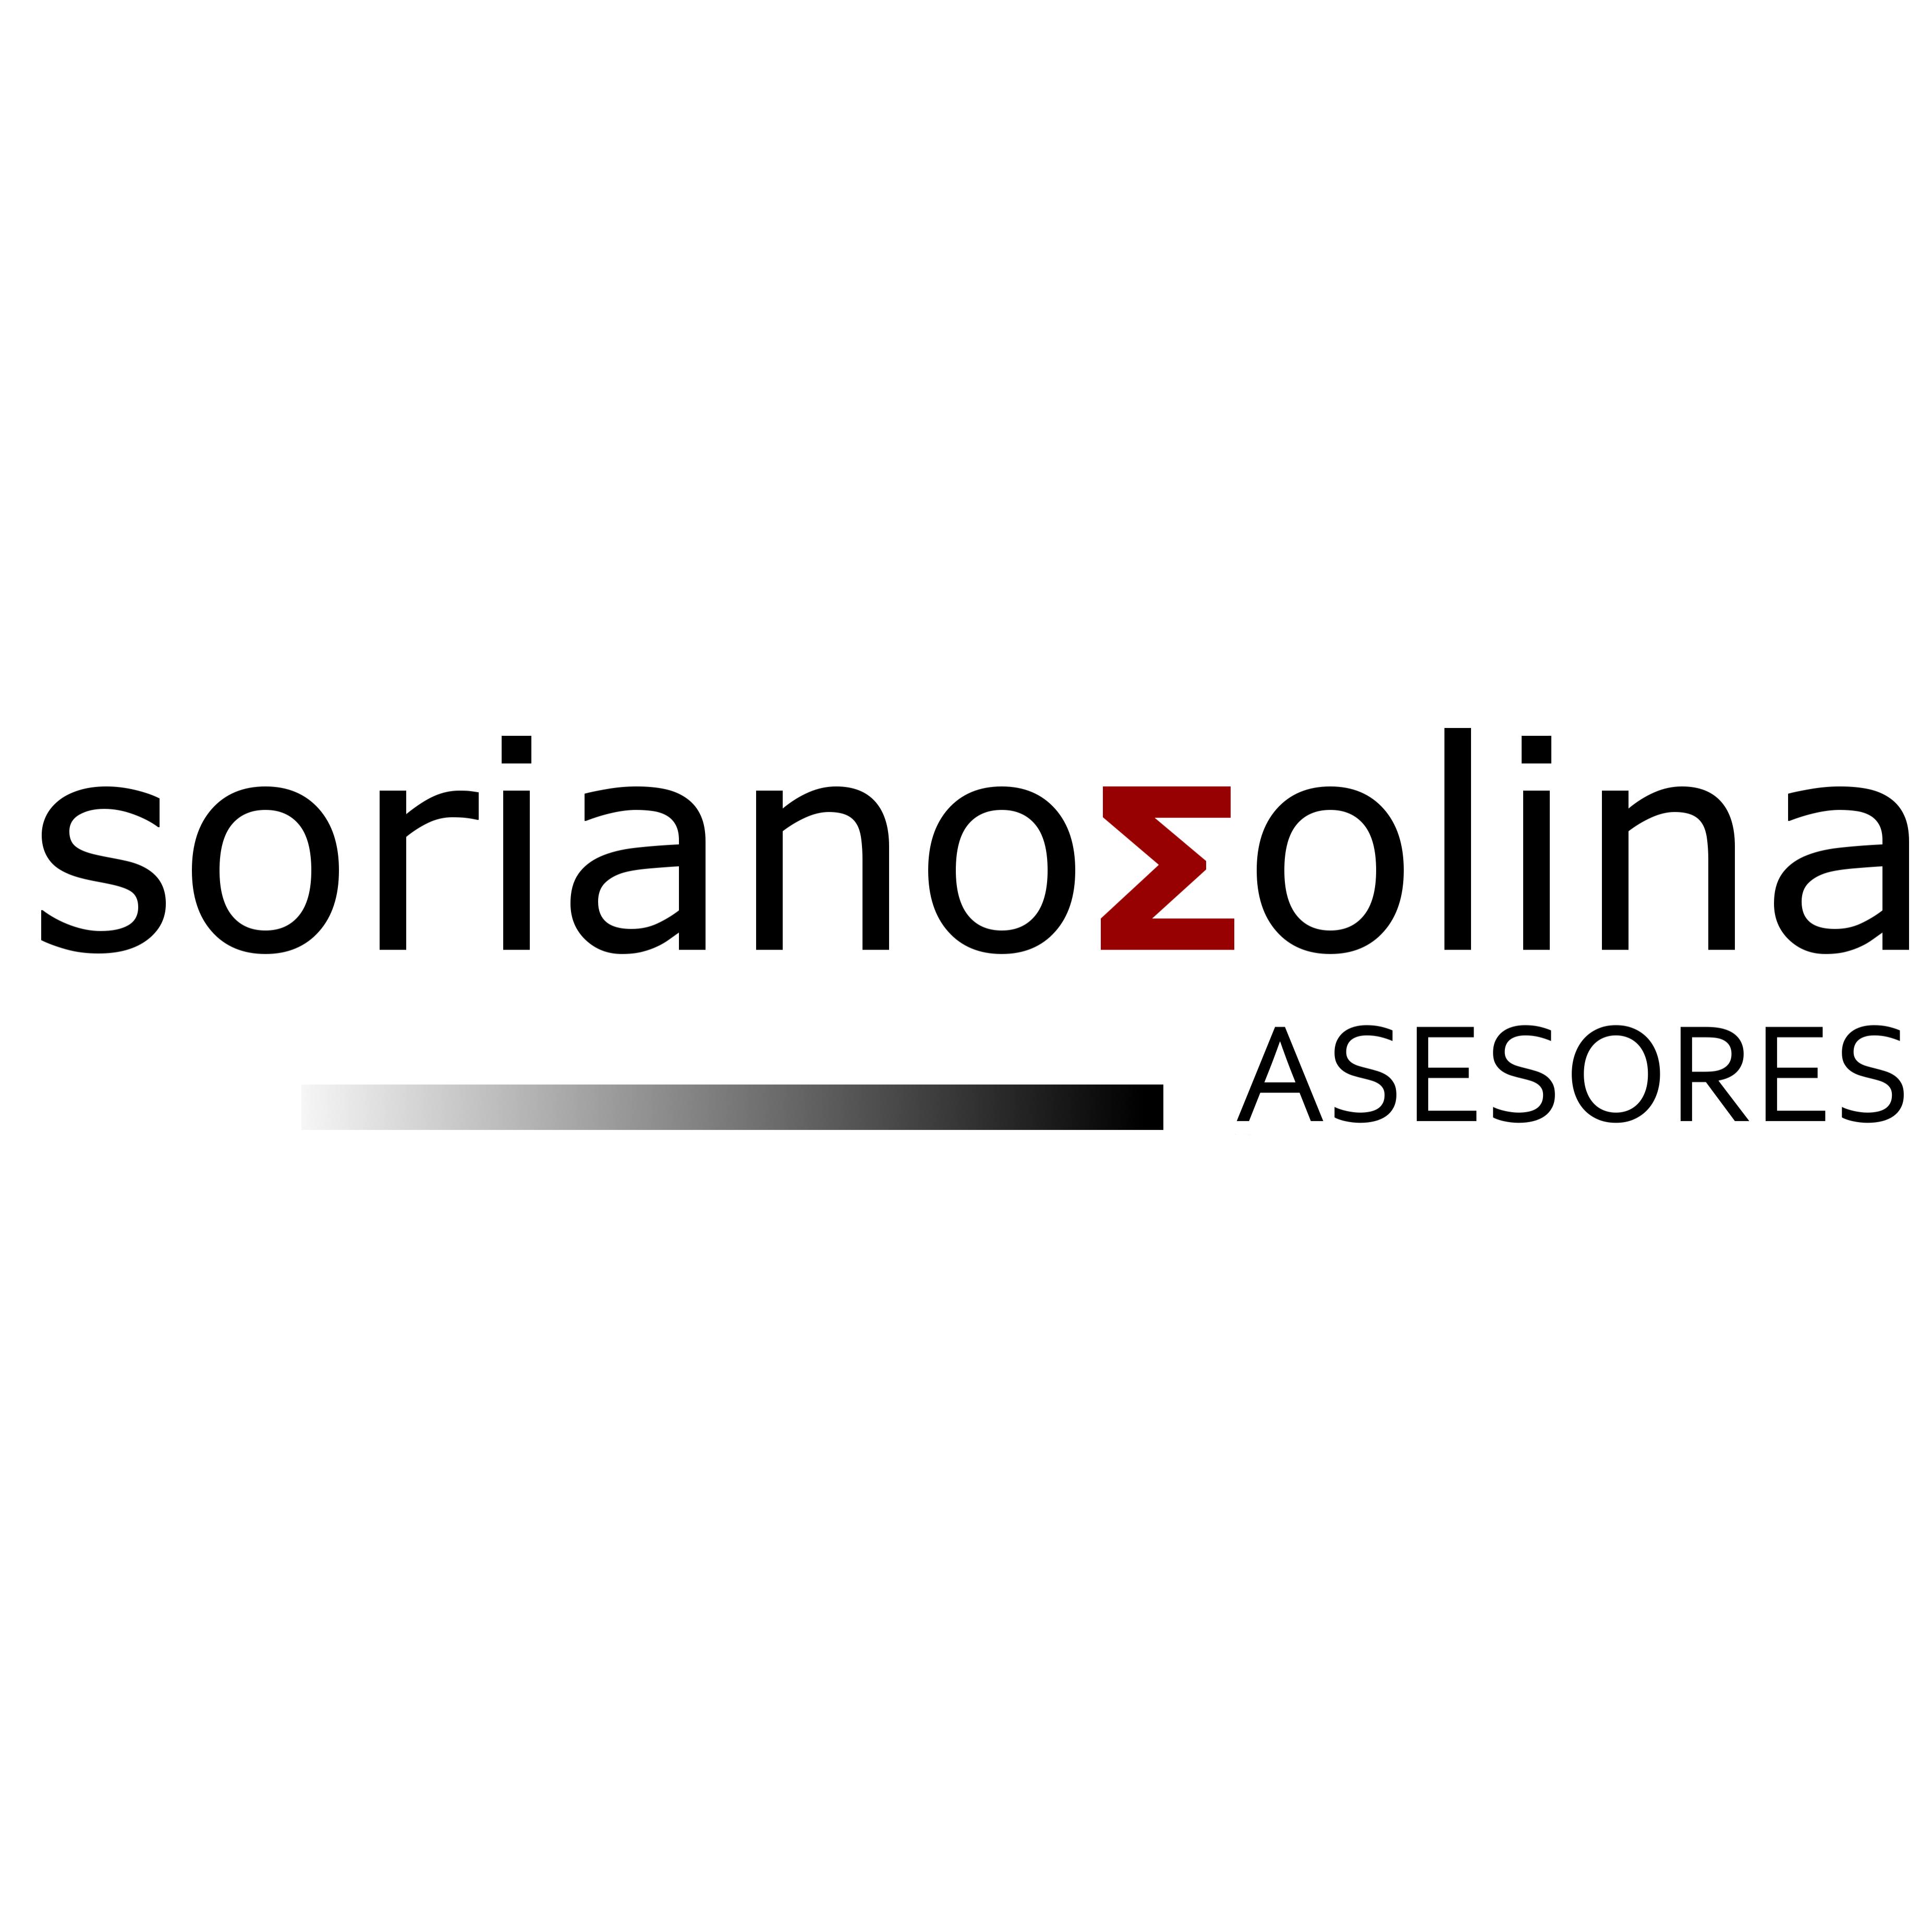 SorianoMolina Asesores